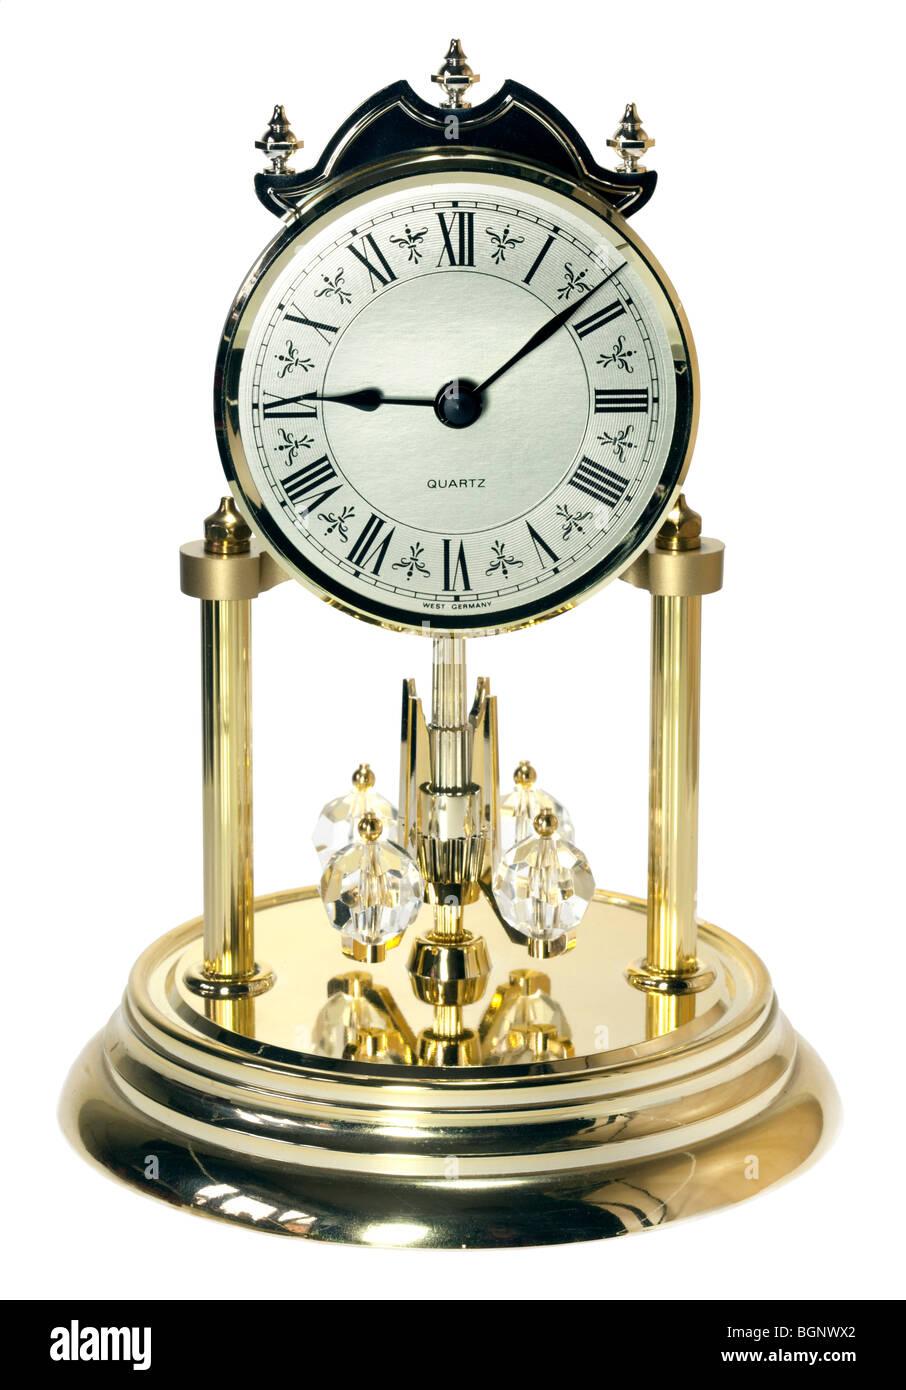 Reloj de péndulo giratorio ornamental Imagen De Stock